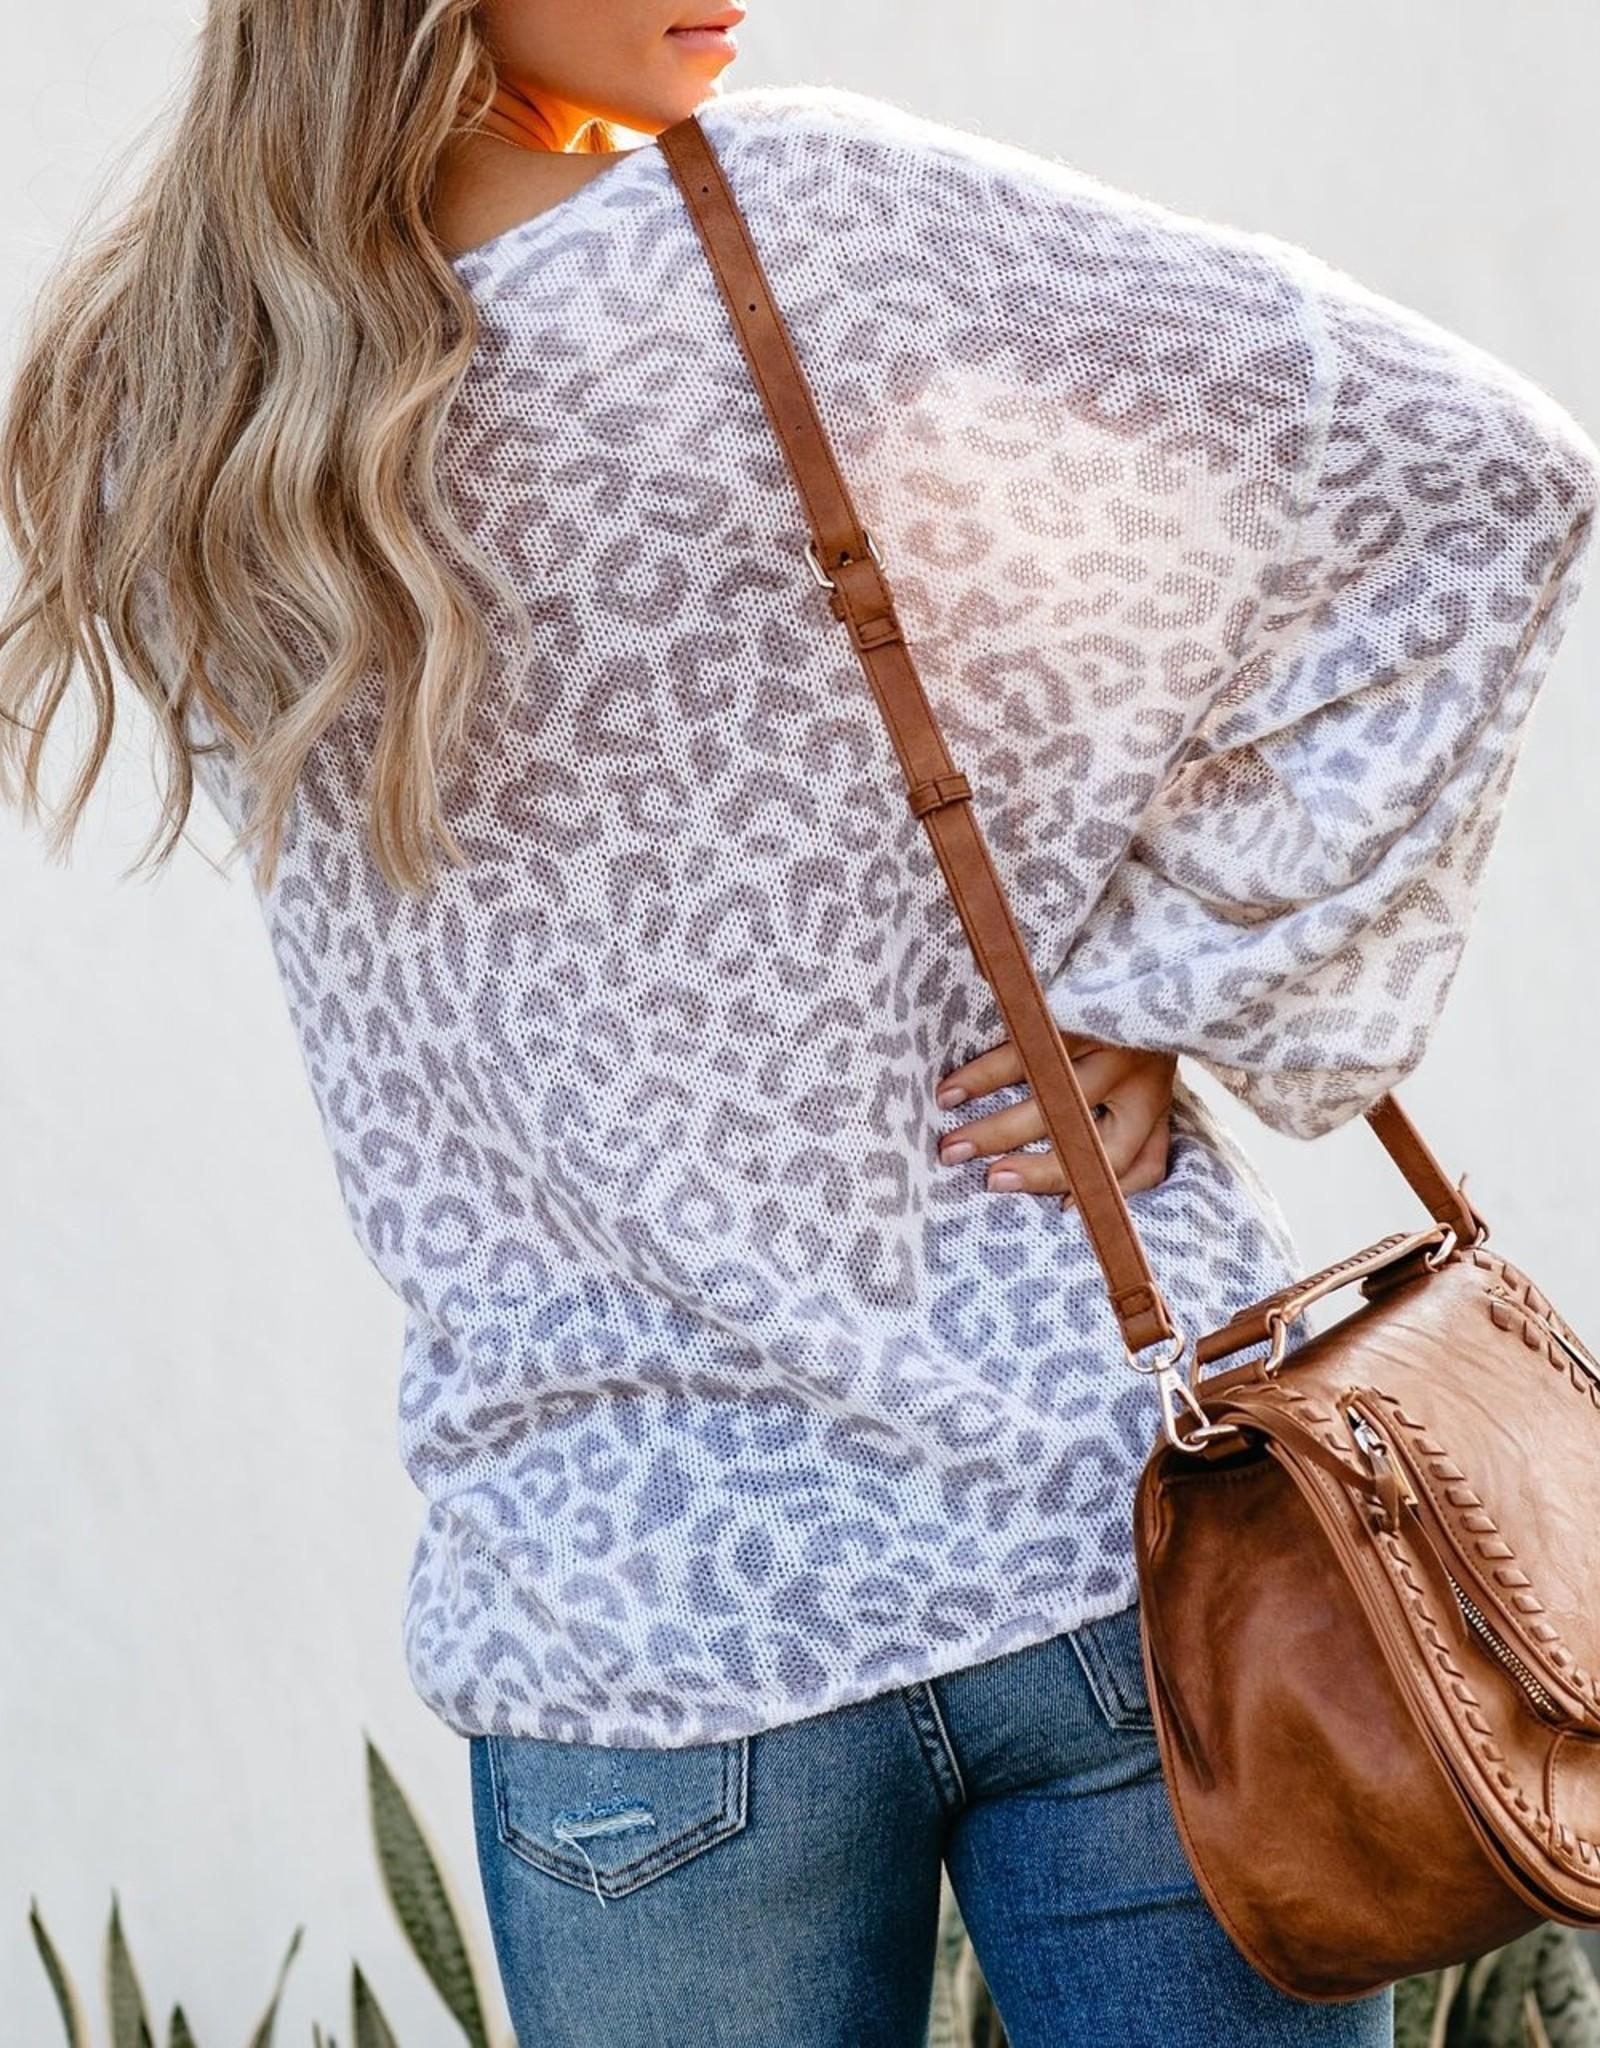 Balloon Sleeve Leopard Knit Sweater in Cream & Grey